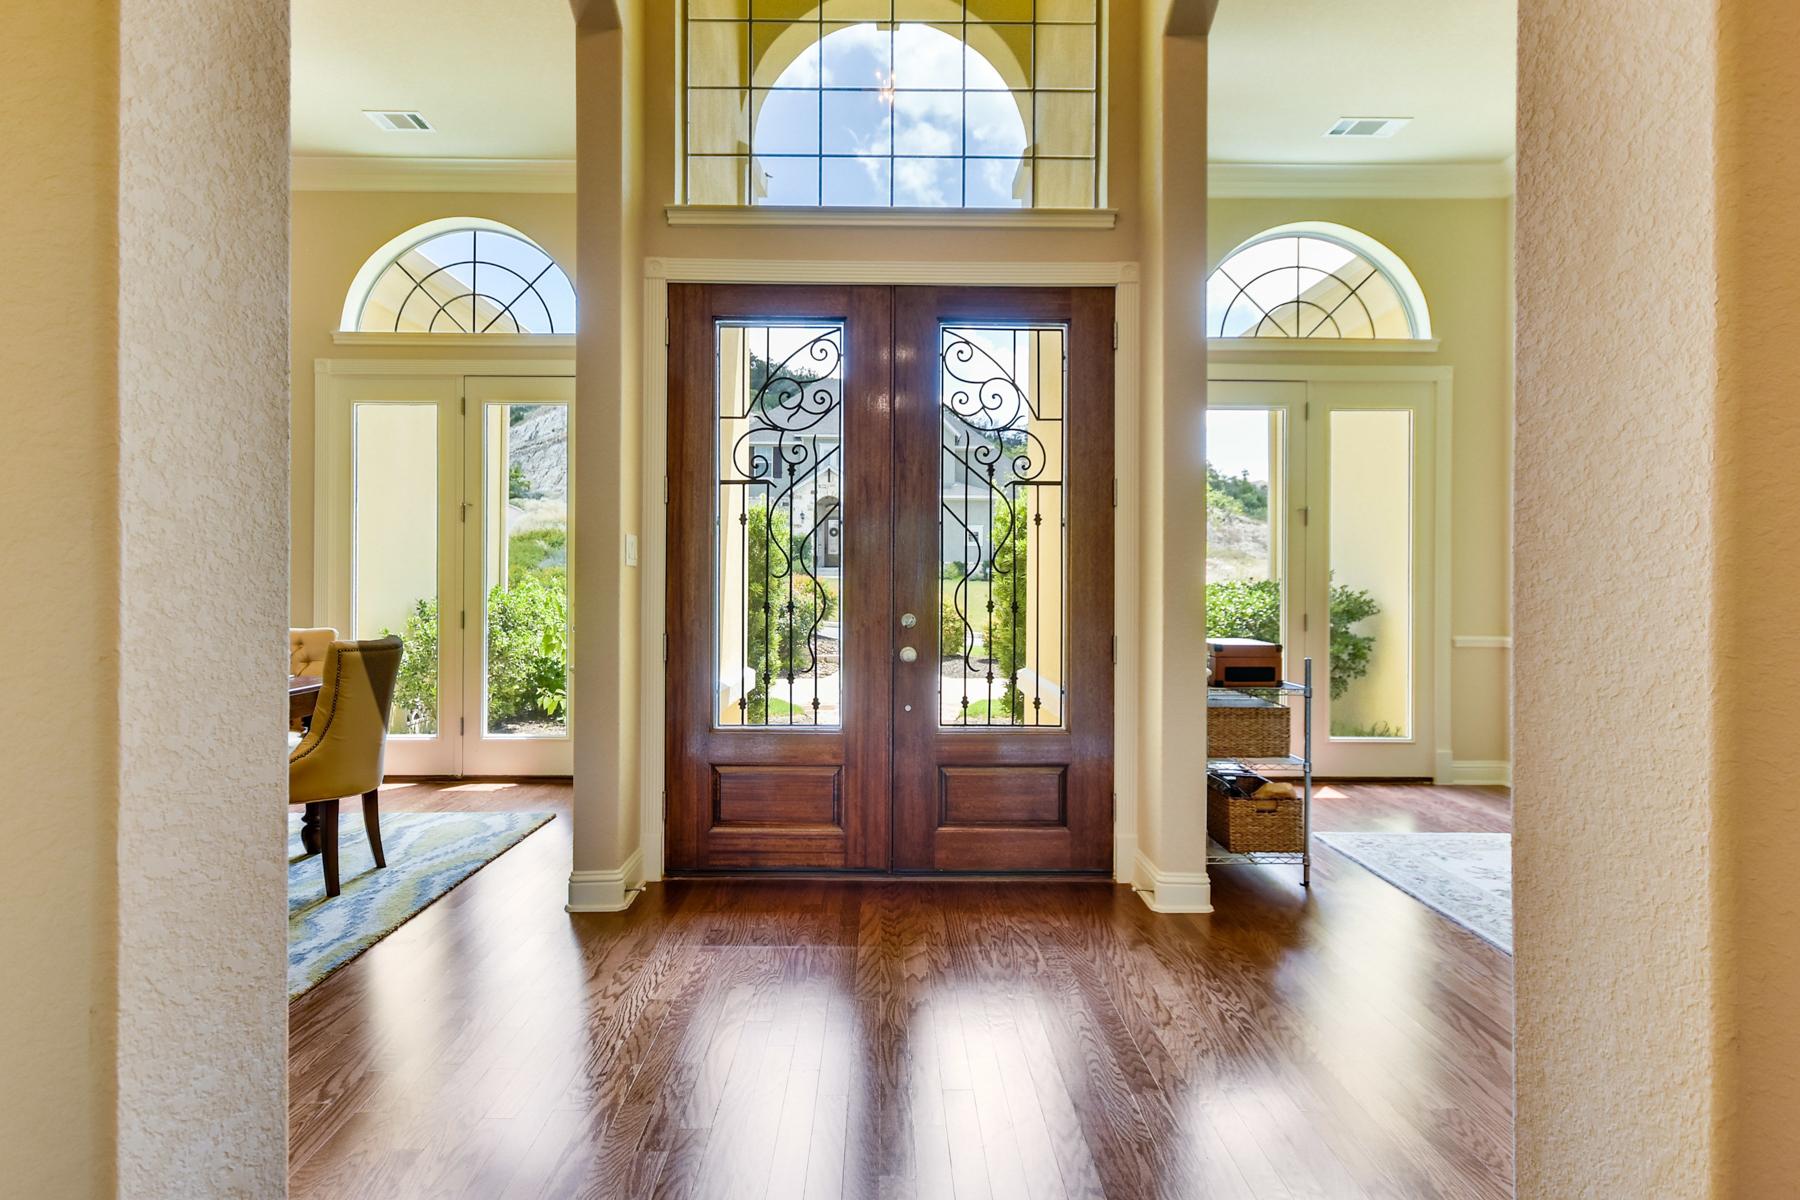 Additional photo for property listing at Stunning Home in The Estates of Sonoma Verde 18027 Resort Way San Antonio, Texas 78255 Estados Unidos